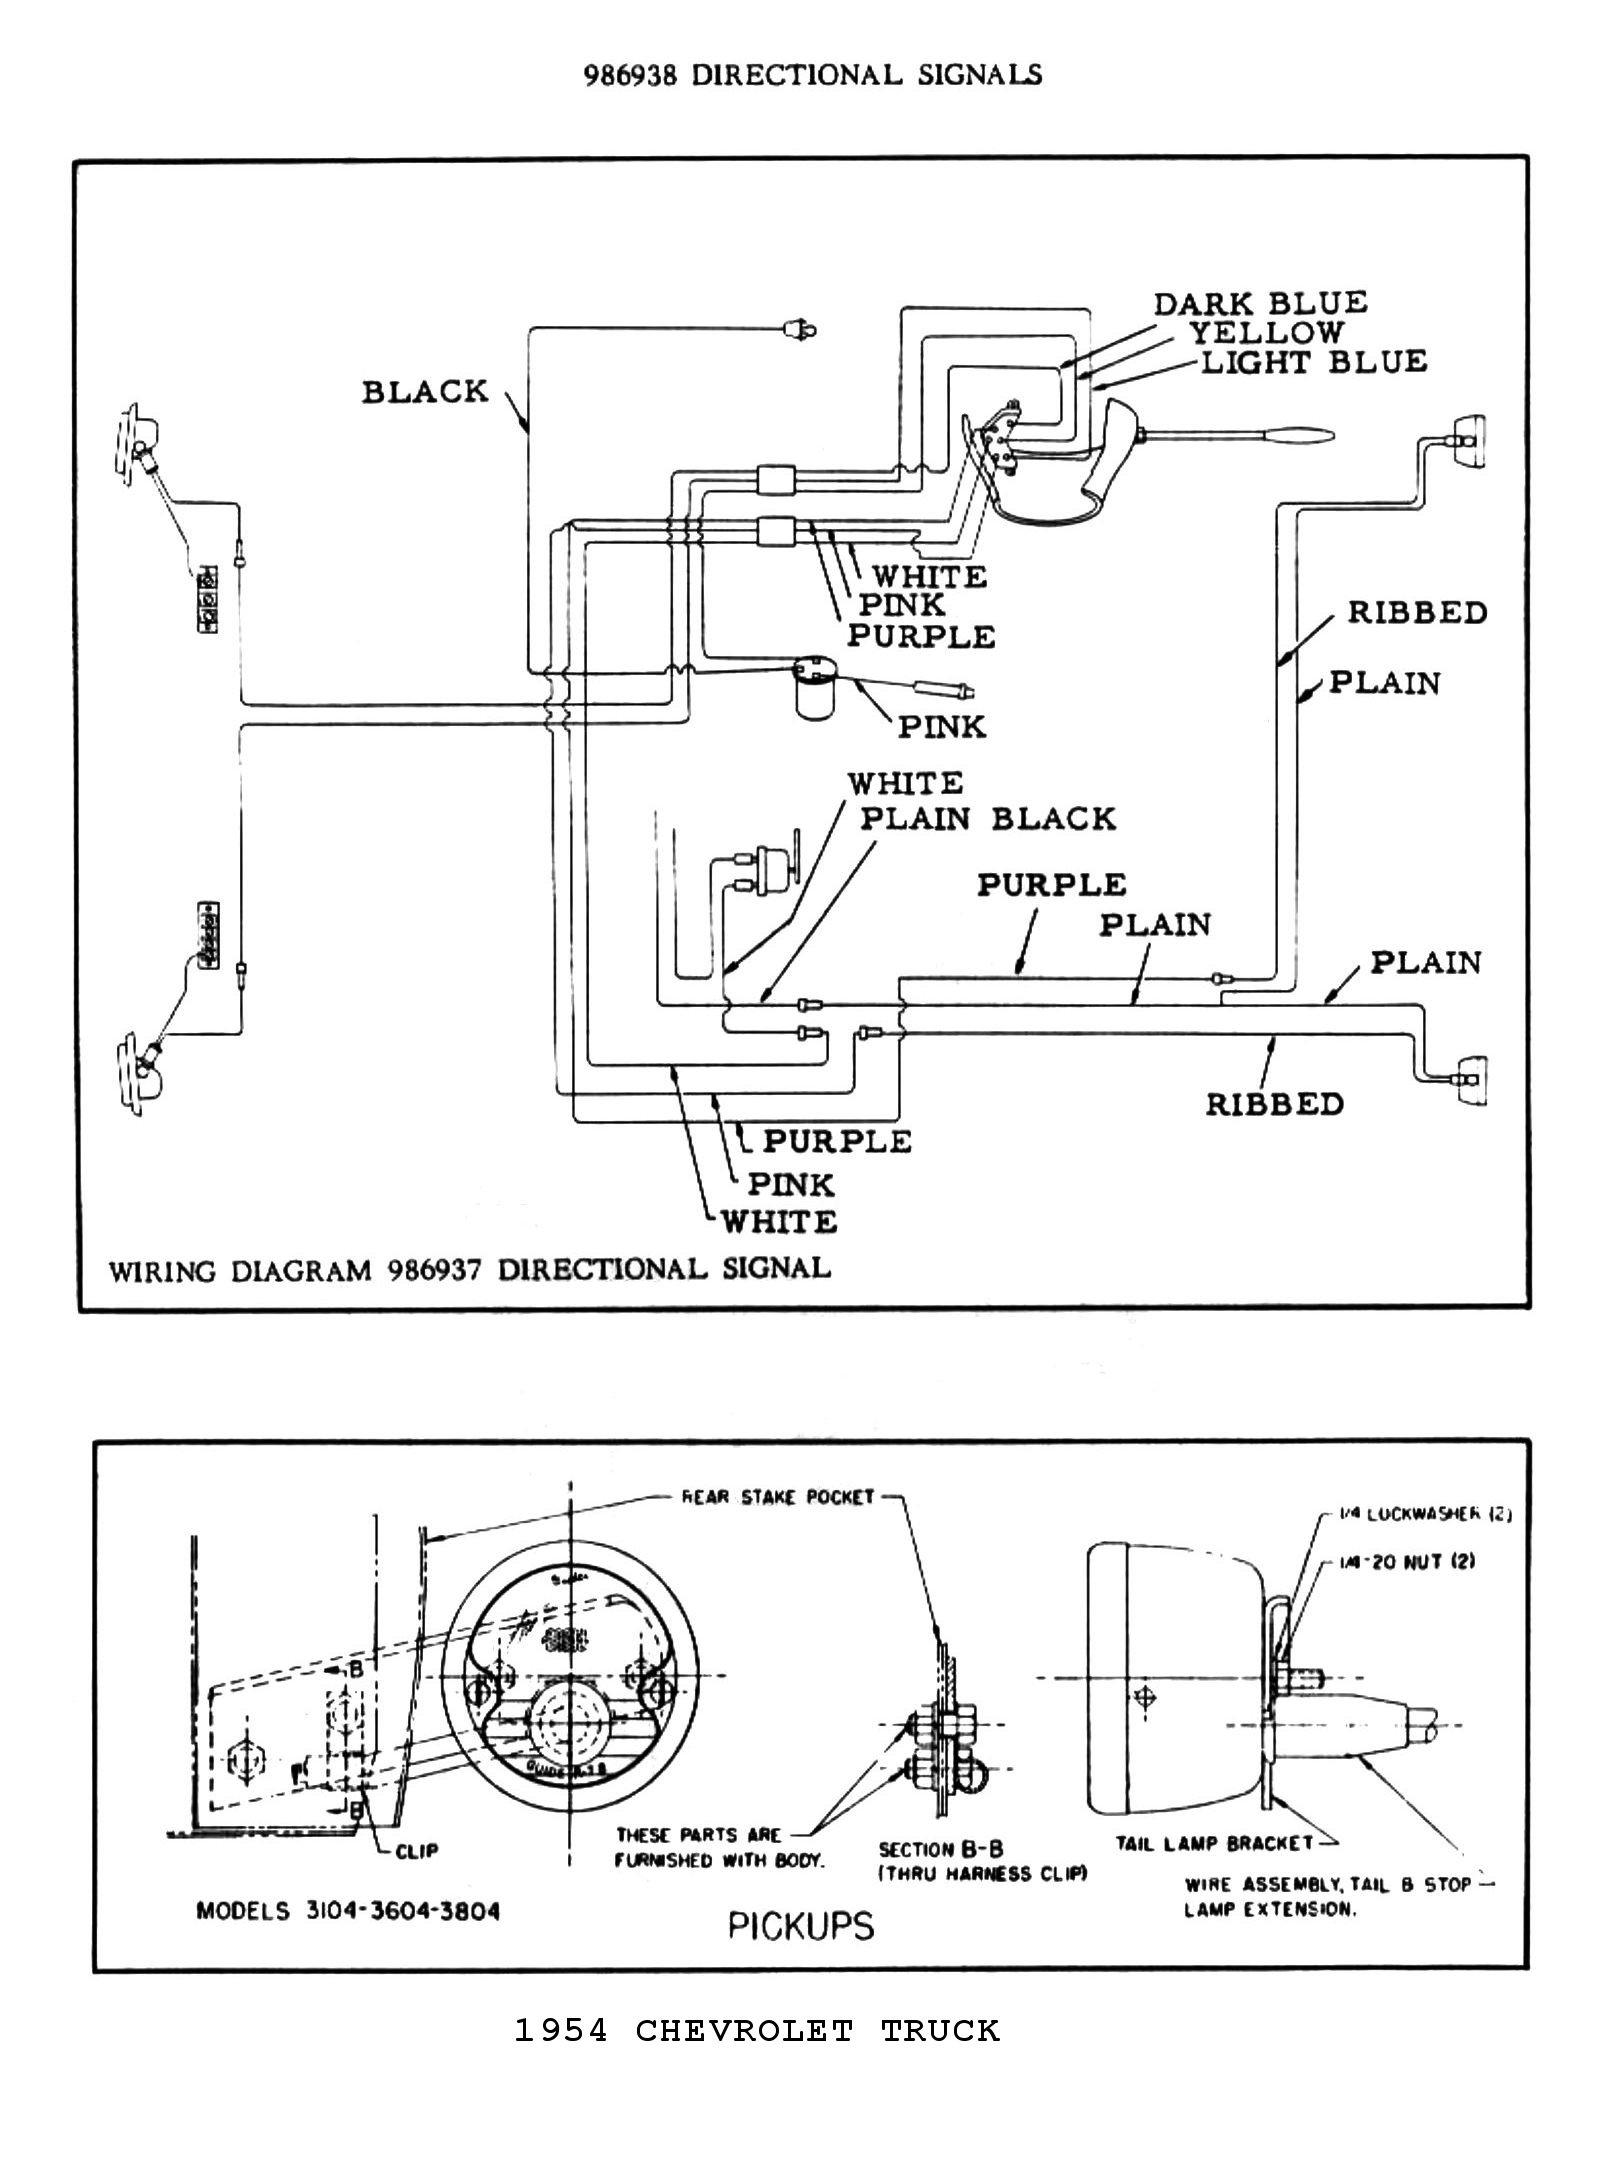 Signal Flasher Wiring Diagram 1954 Led Flasher Wiring Diagram Signal  Flasher Wiring Diagram 1954. Source. 54 chevy turn signal ...